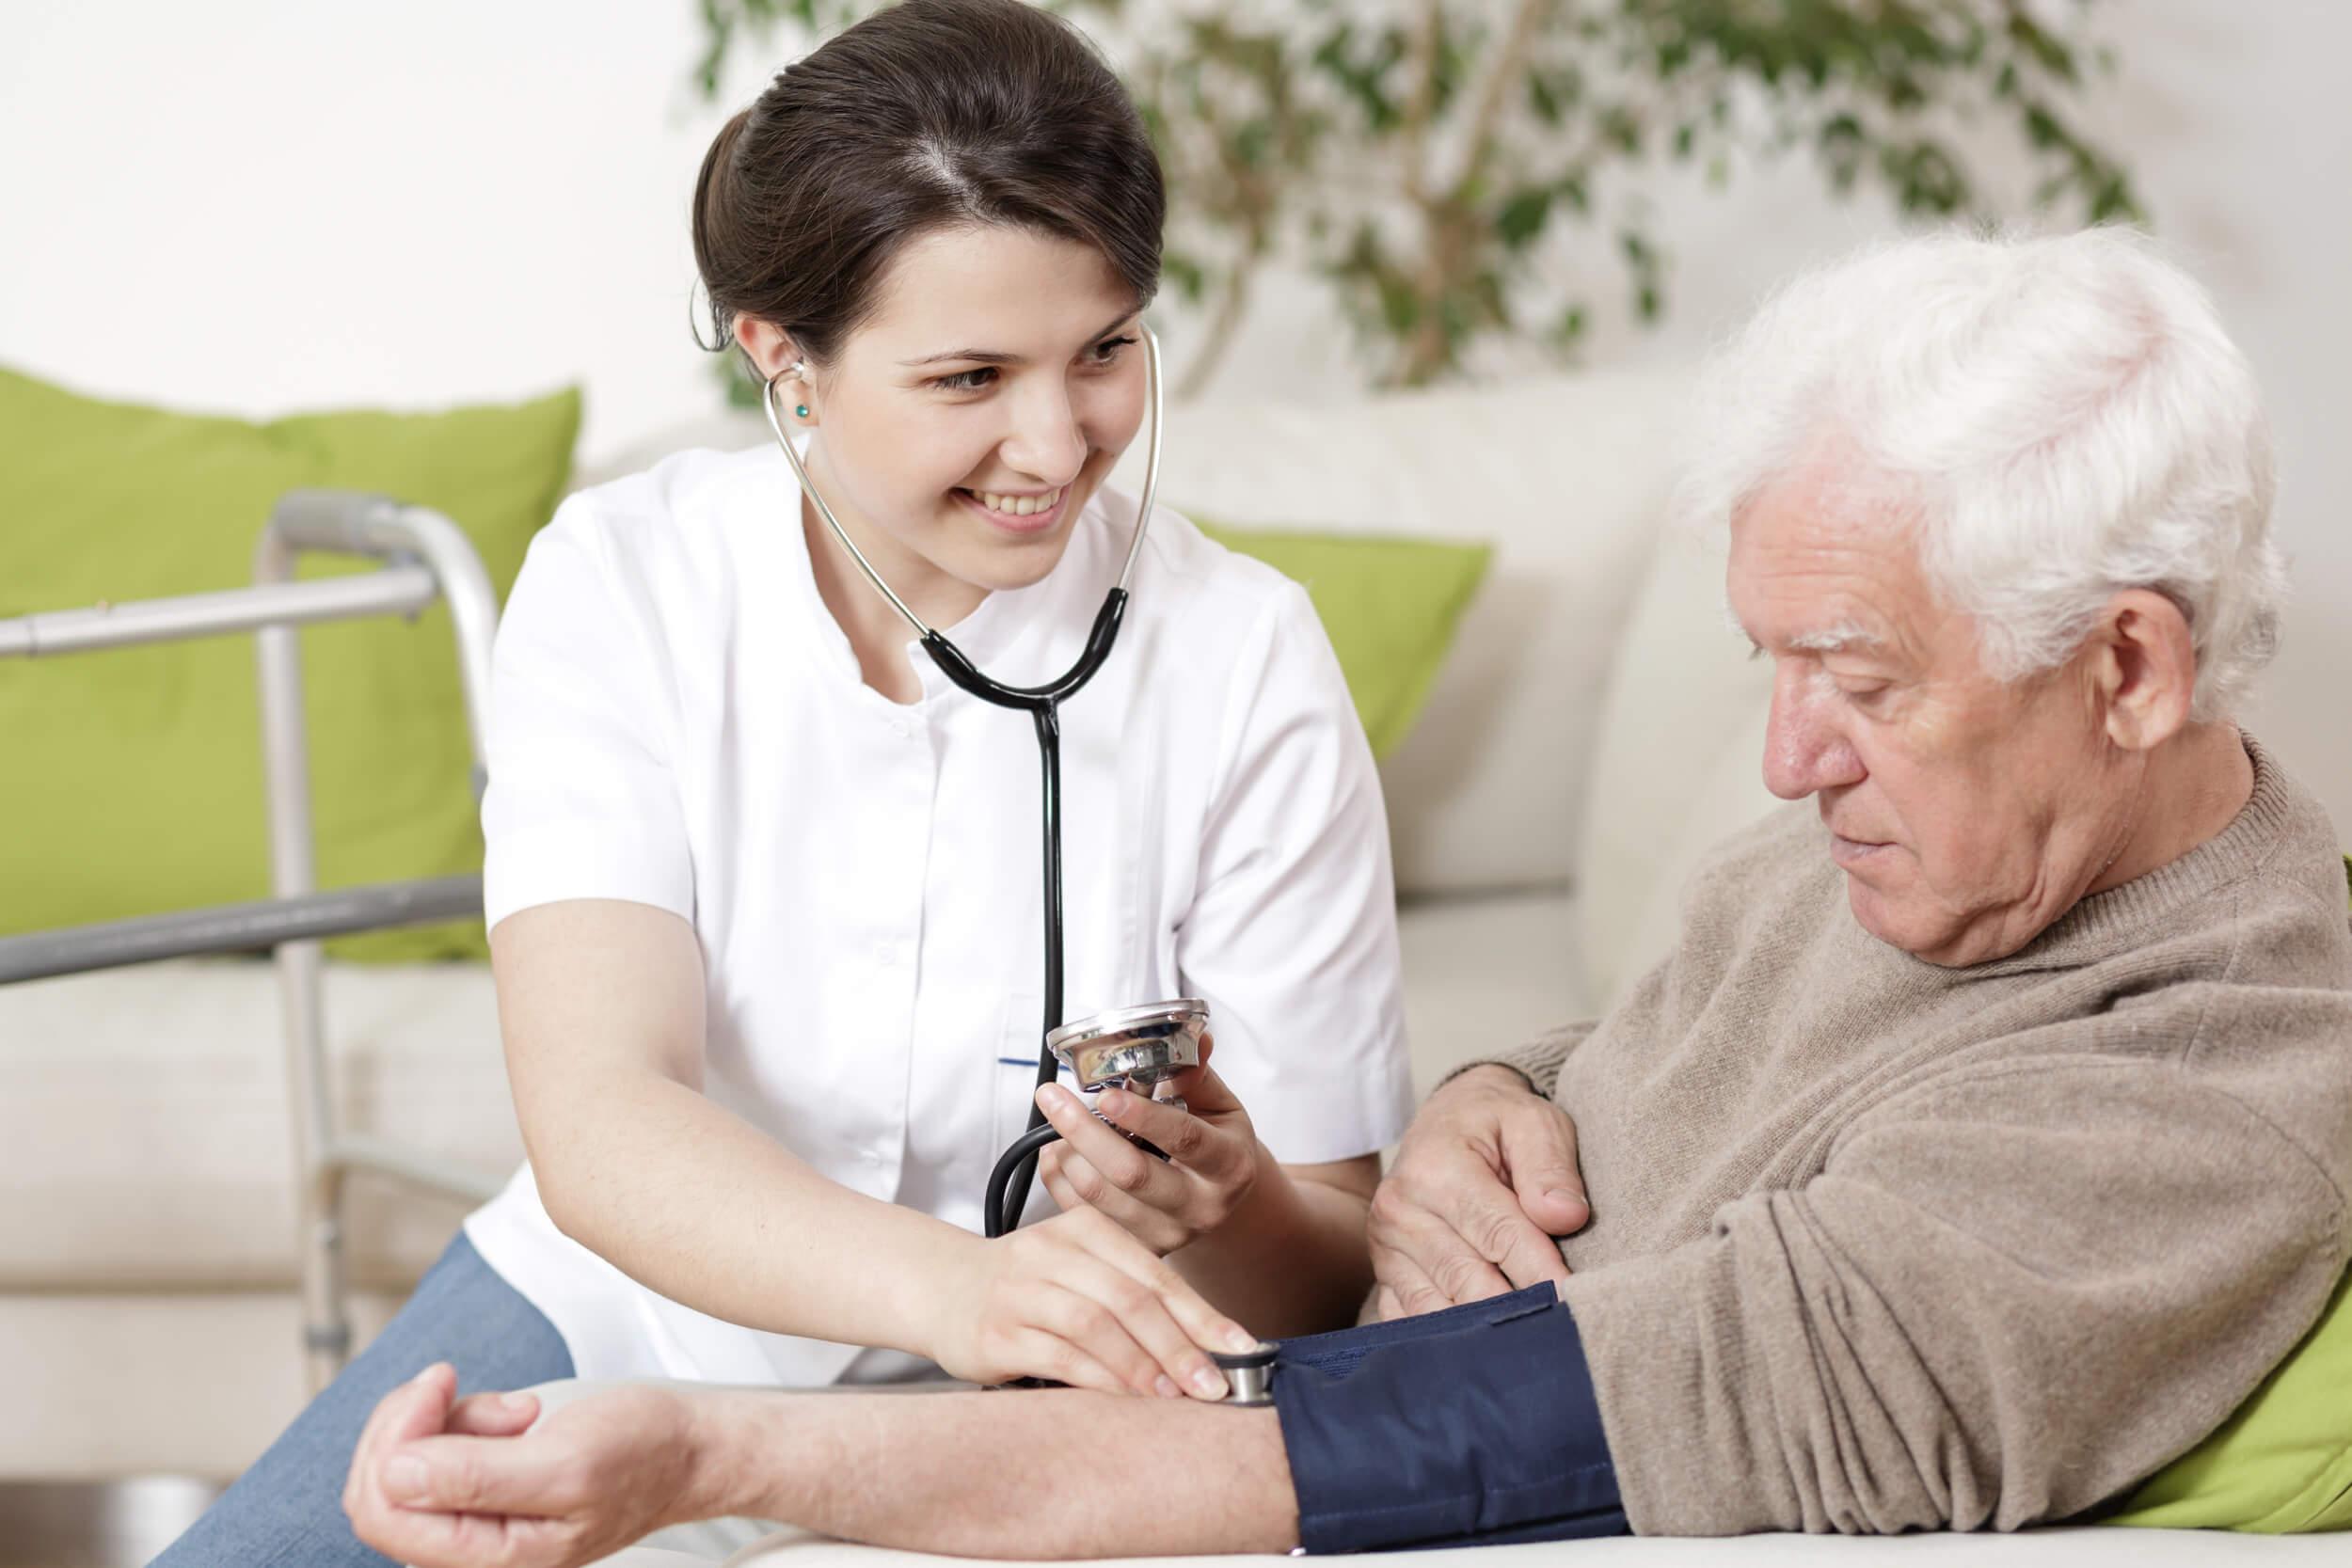 UK Caring Services Nurse Measuring Blood Pressure